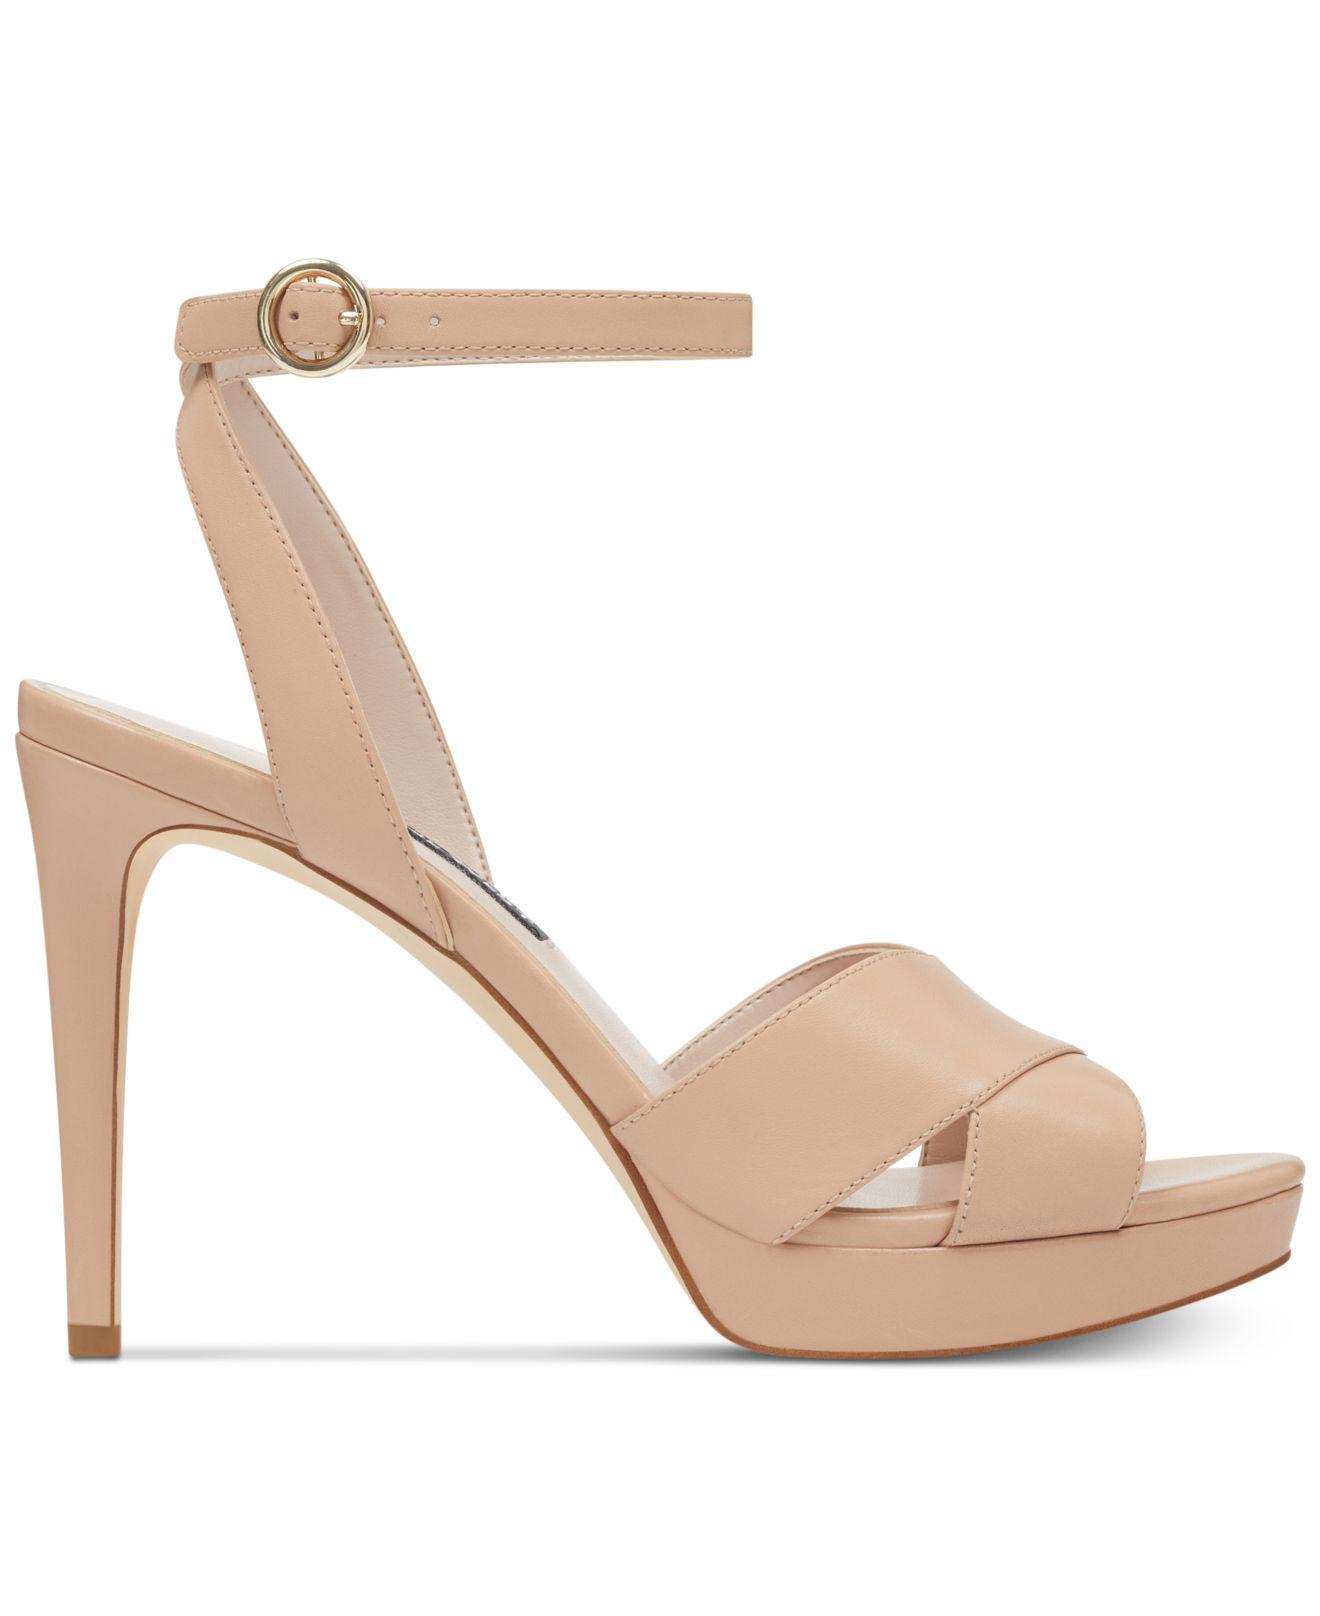 6c08f17b2e Nine West Quisha Platform Sandals in Natural - Lyst